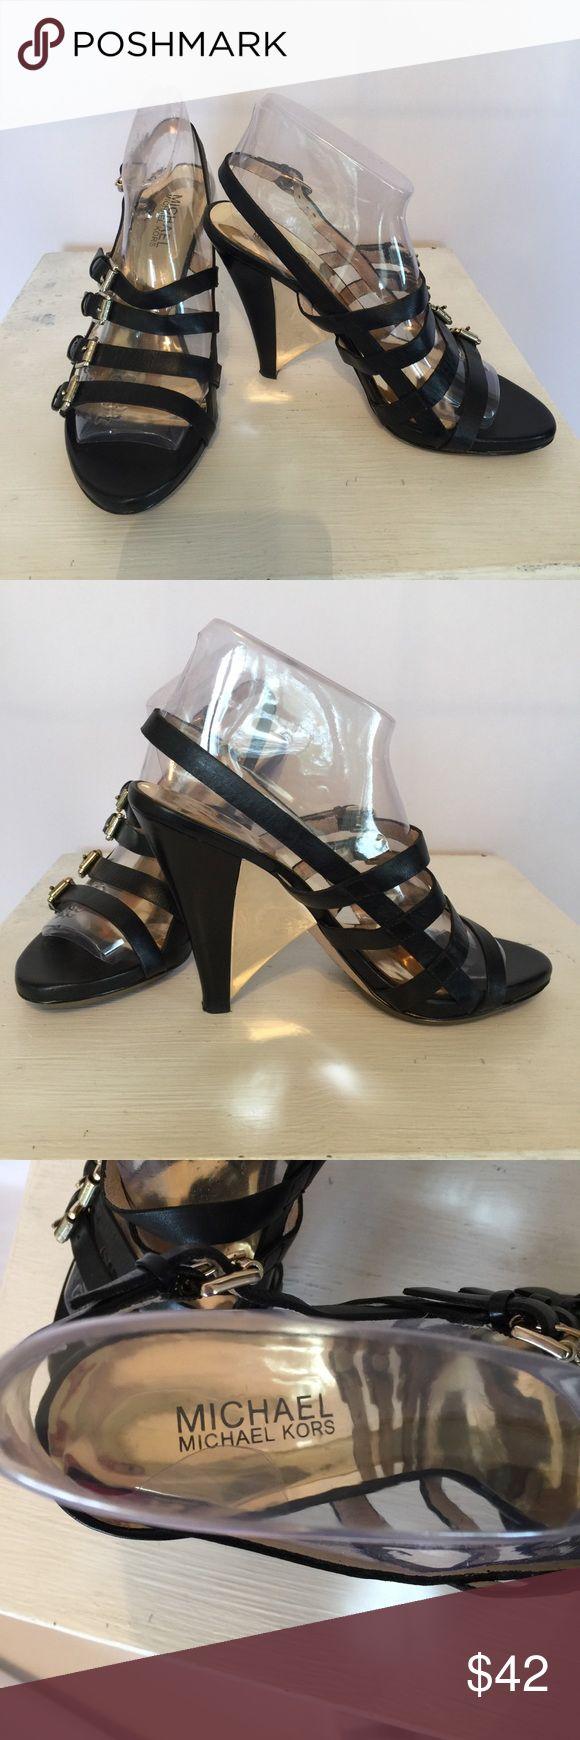 "Michael Kors Black Strappy Heels Michael Kors Black Strappy Heels with gold buckles and a shiny gold wedge. Heel is 4 1/2 "" High. Beautiful shoes.  Worn very little. Michael Kors Shoes Heels"